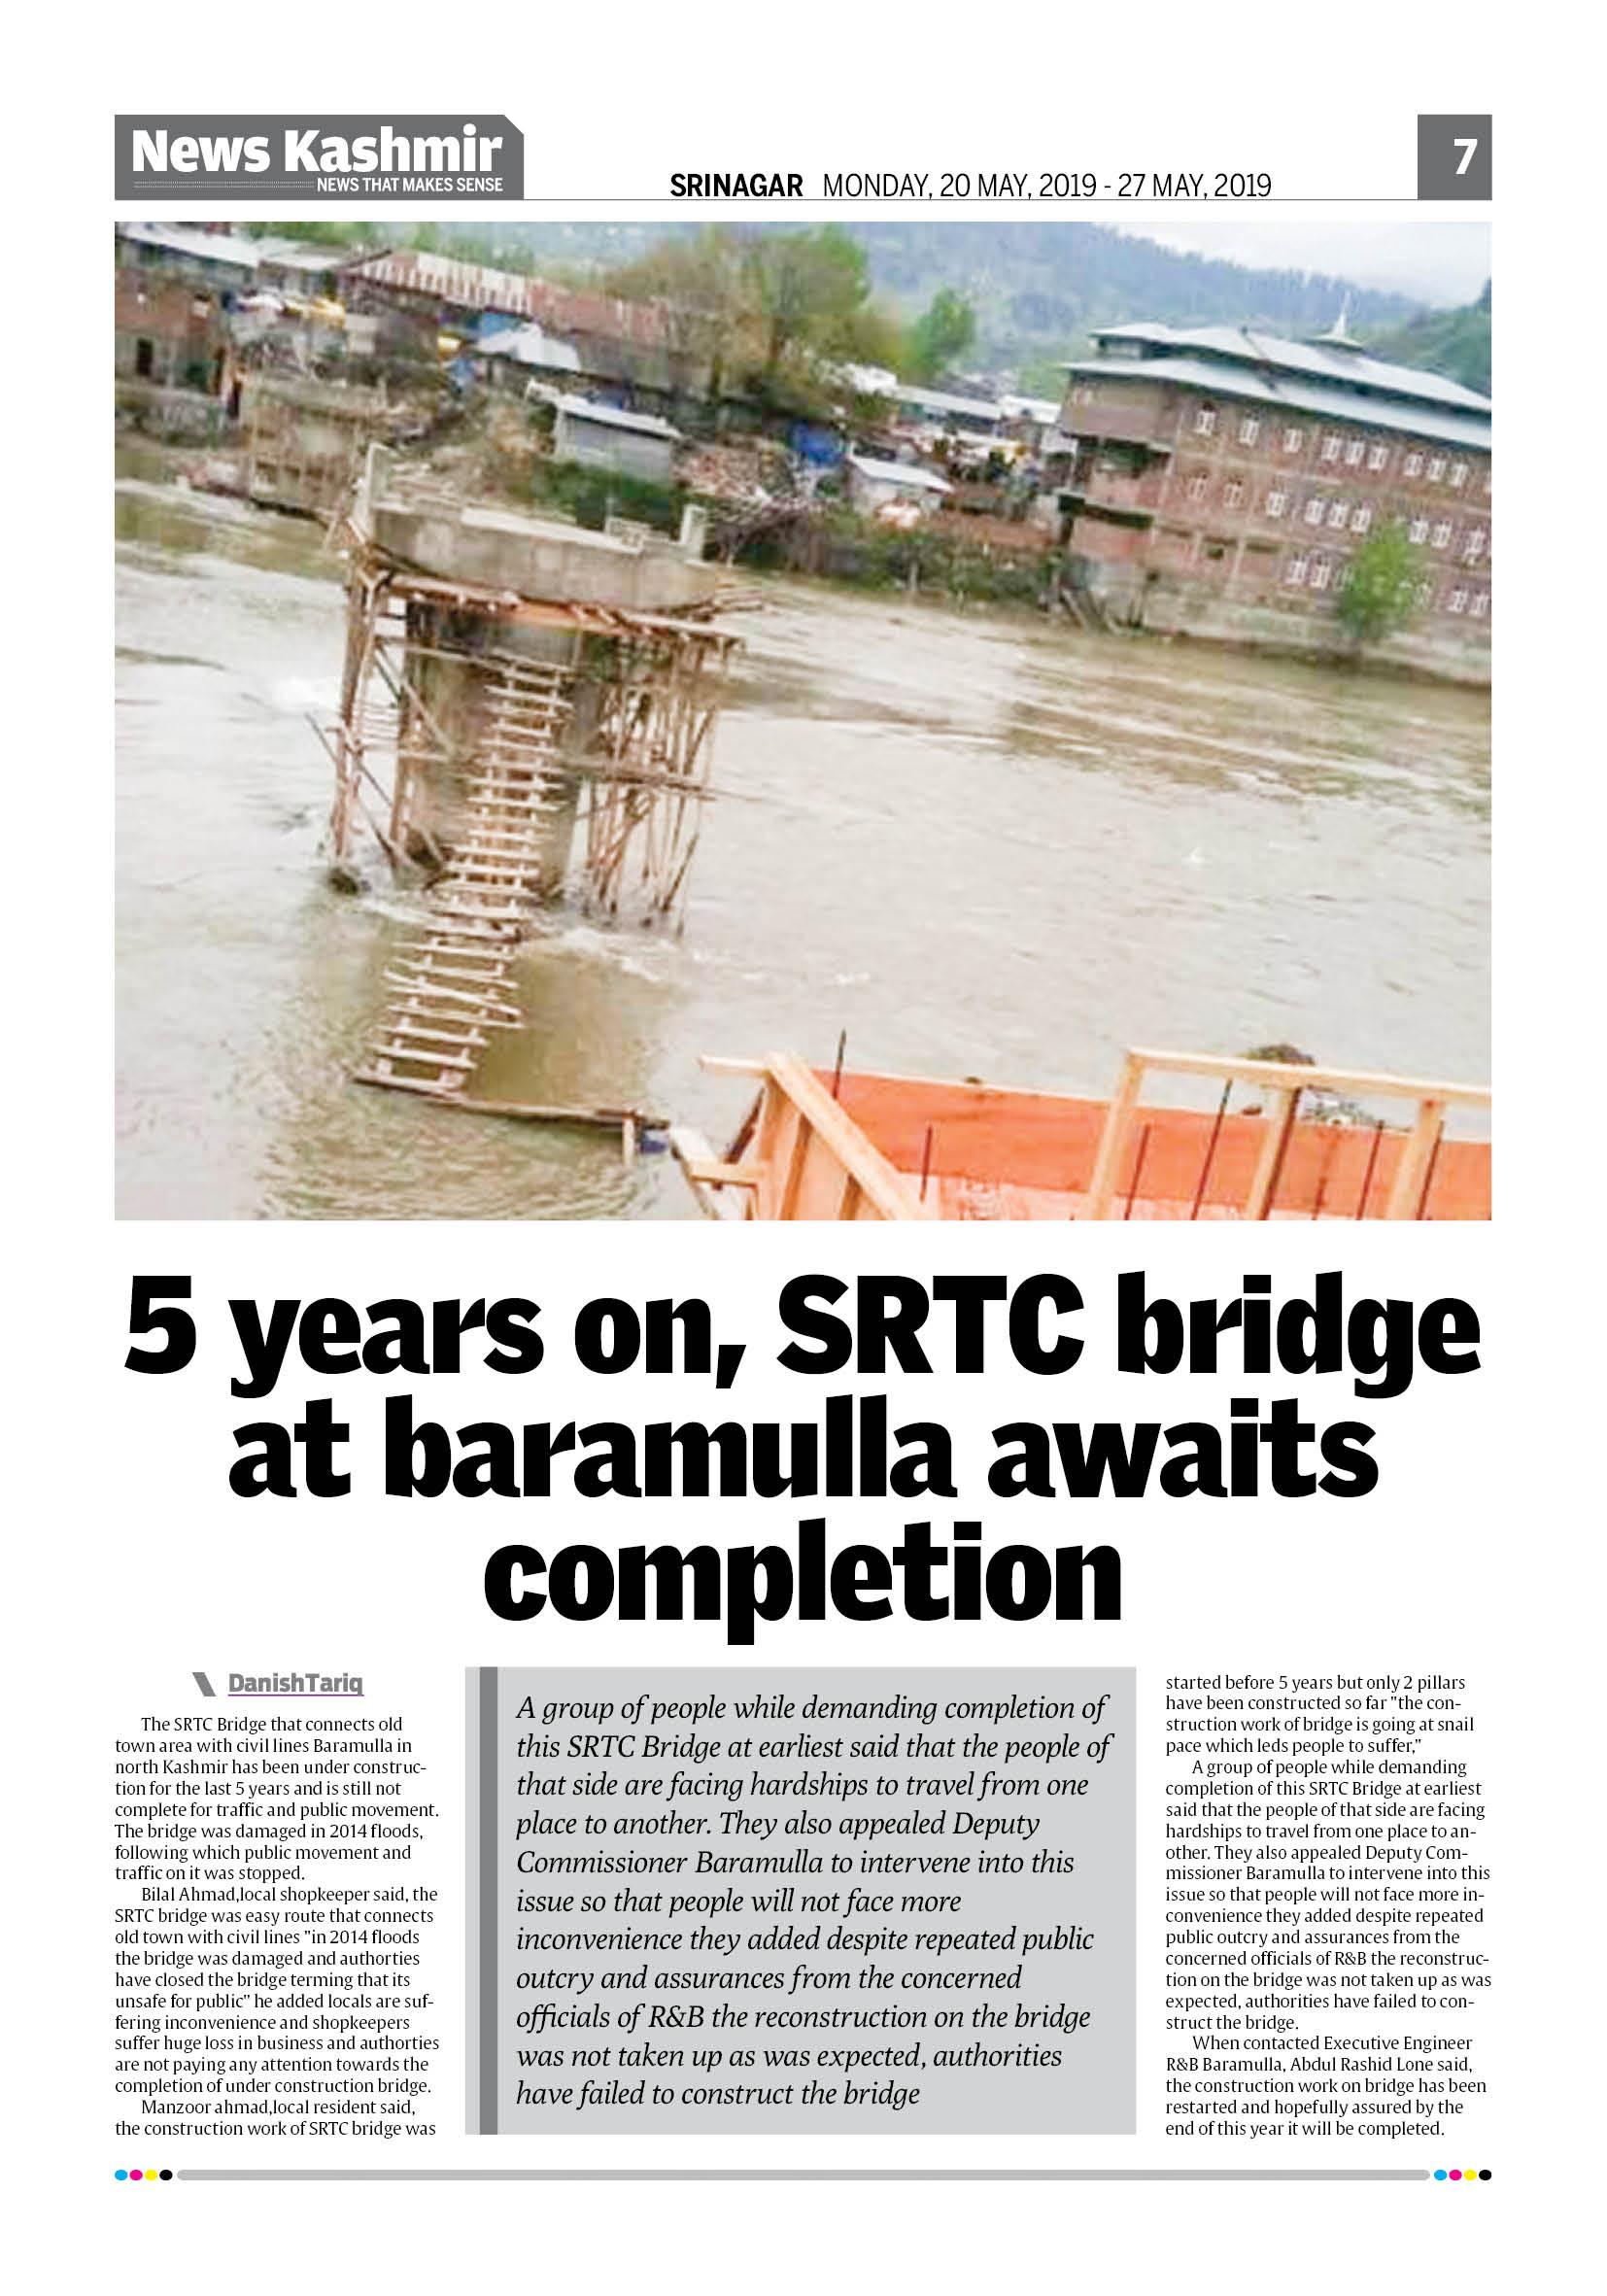 5 years on,SRTC bridge at Baramulla awaits completion